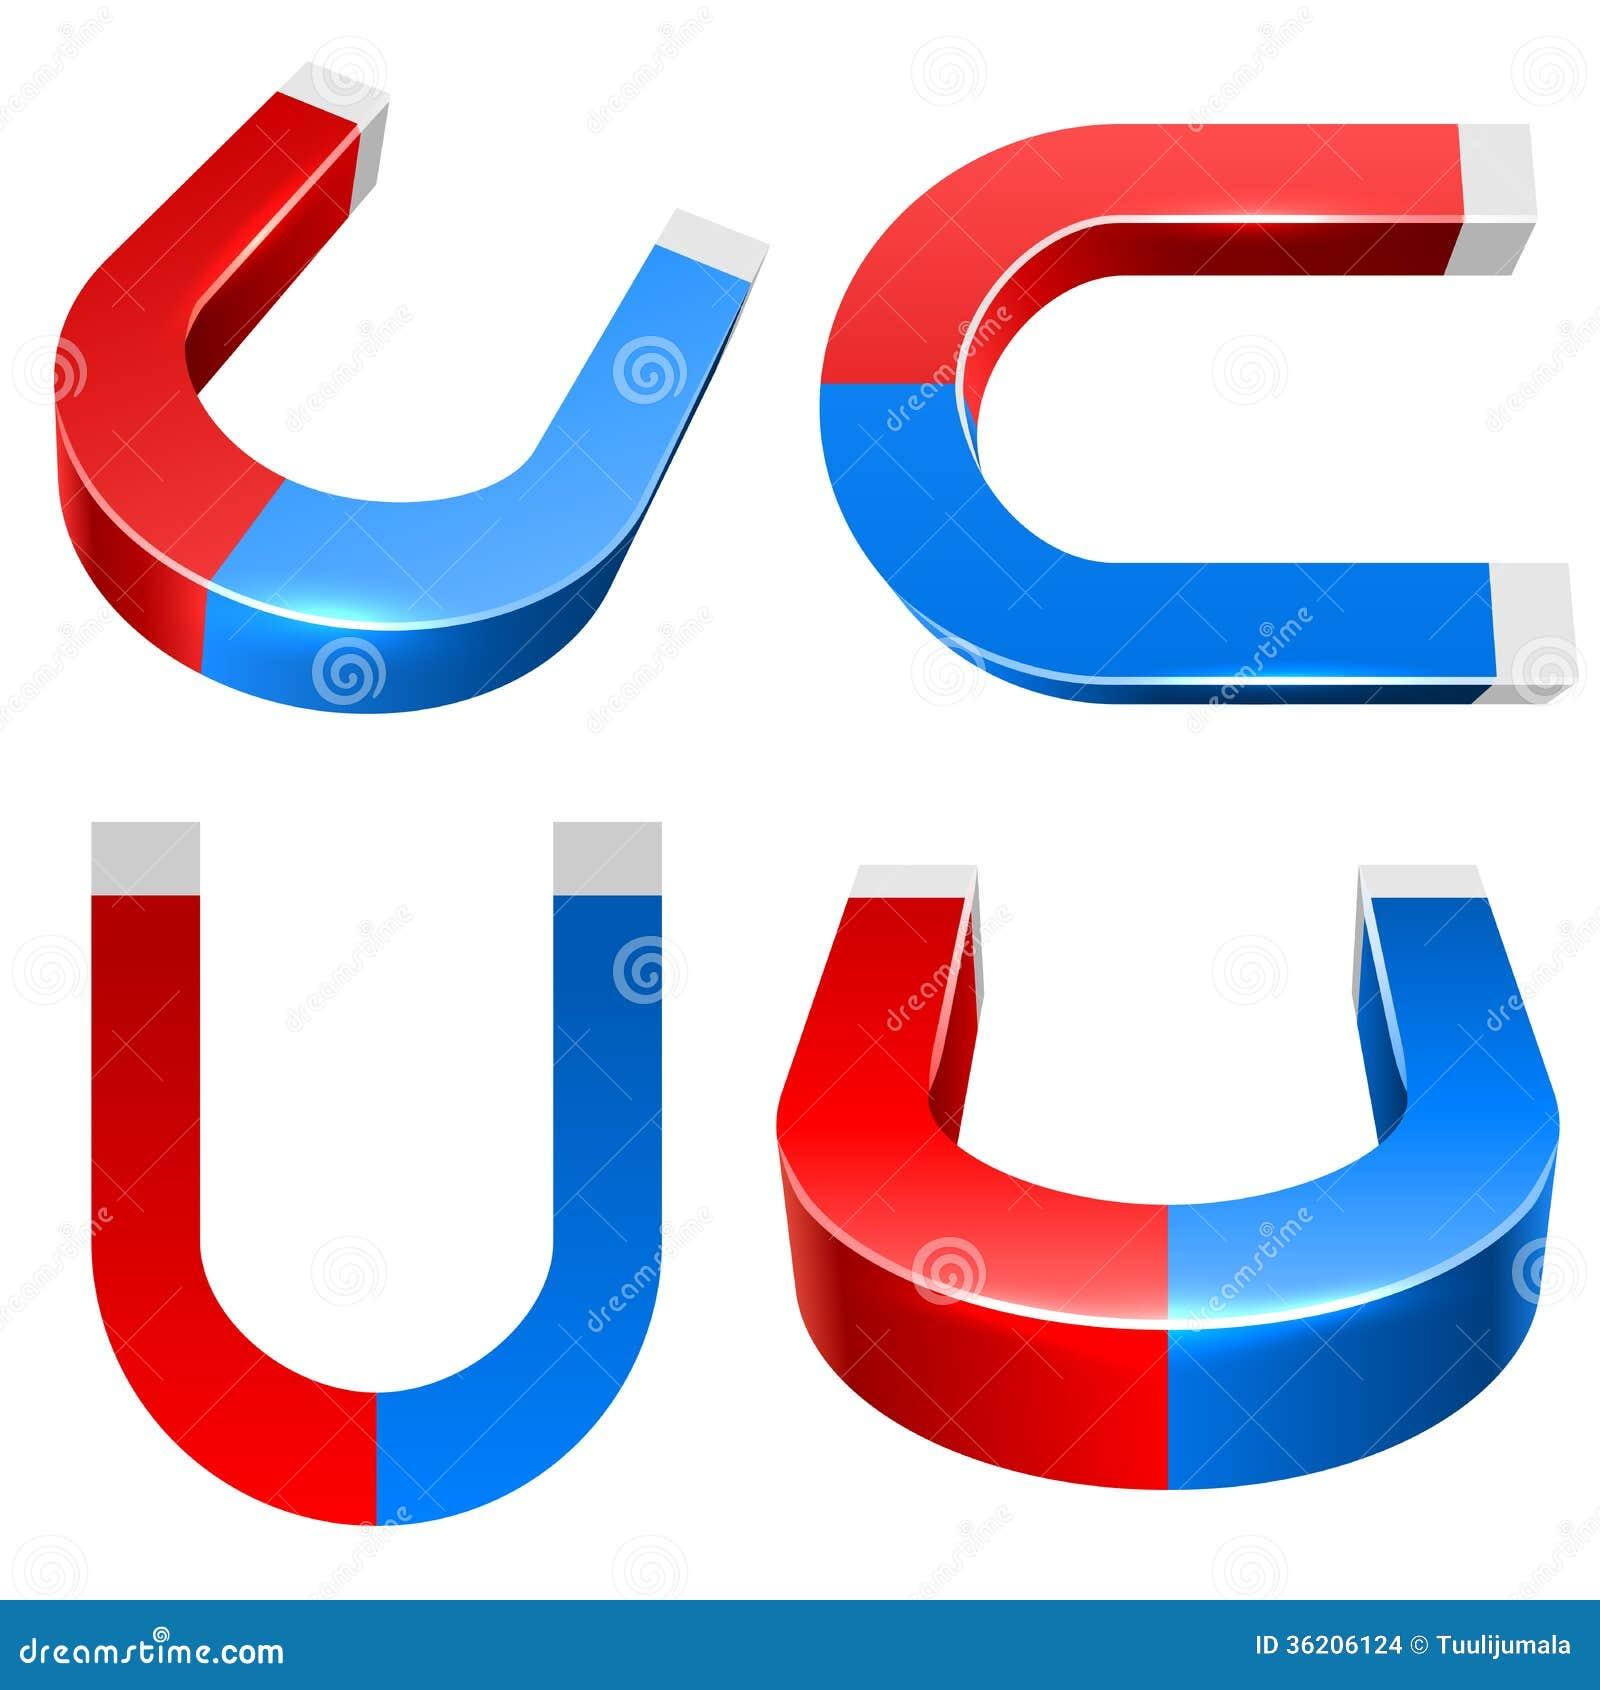 red magnet icon cartoon vector cartoondealer com 79819421 horseshoe magnet clipart Clip Art Round Magnet Disc